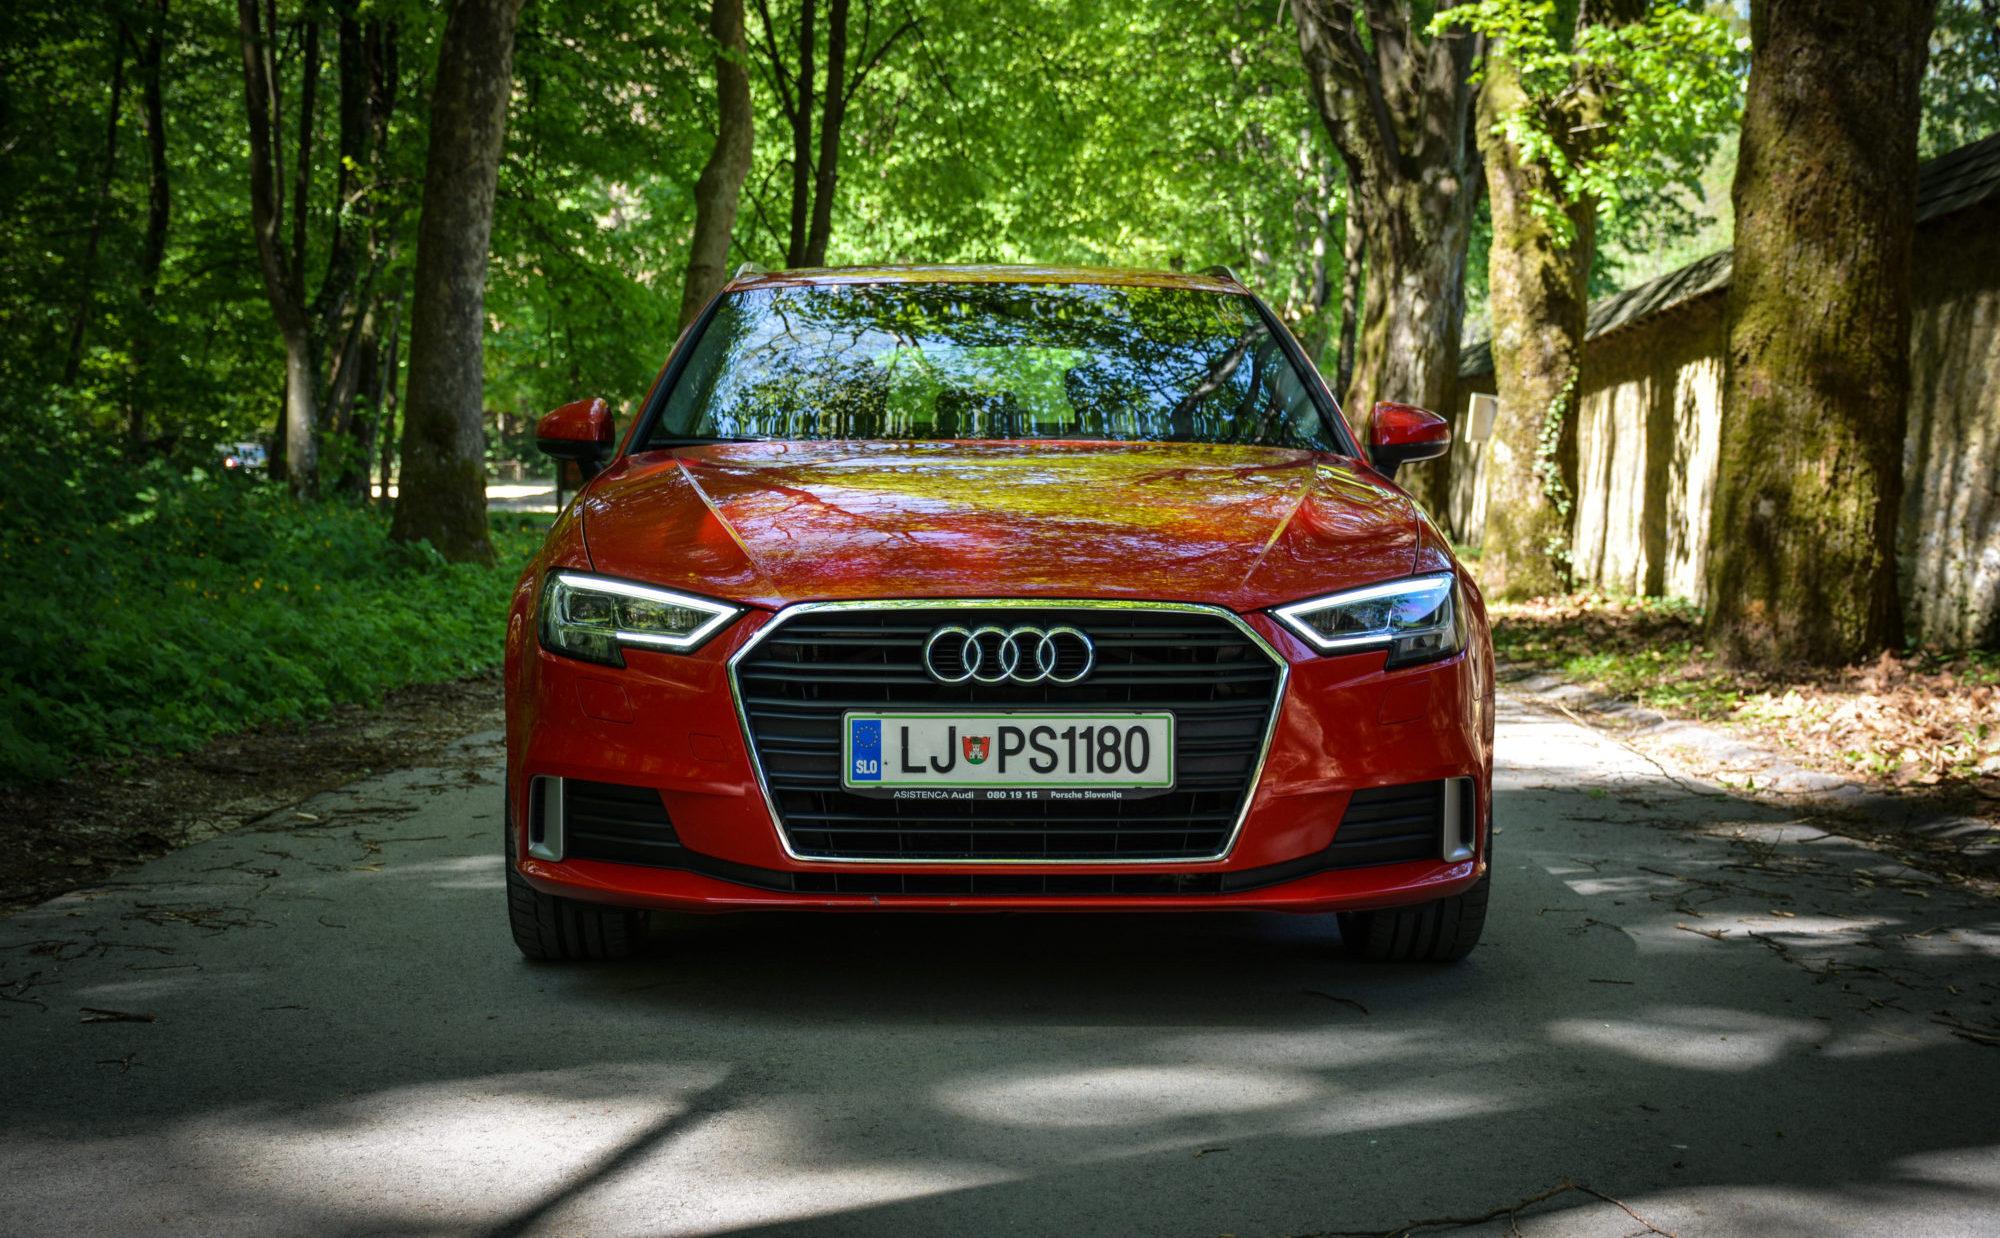 Test: Audi A3 Sportback Sport 1.4 TFSI S tronic (definicija odlične družinske kombilimuzine)